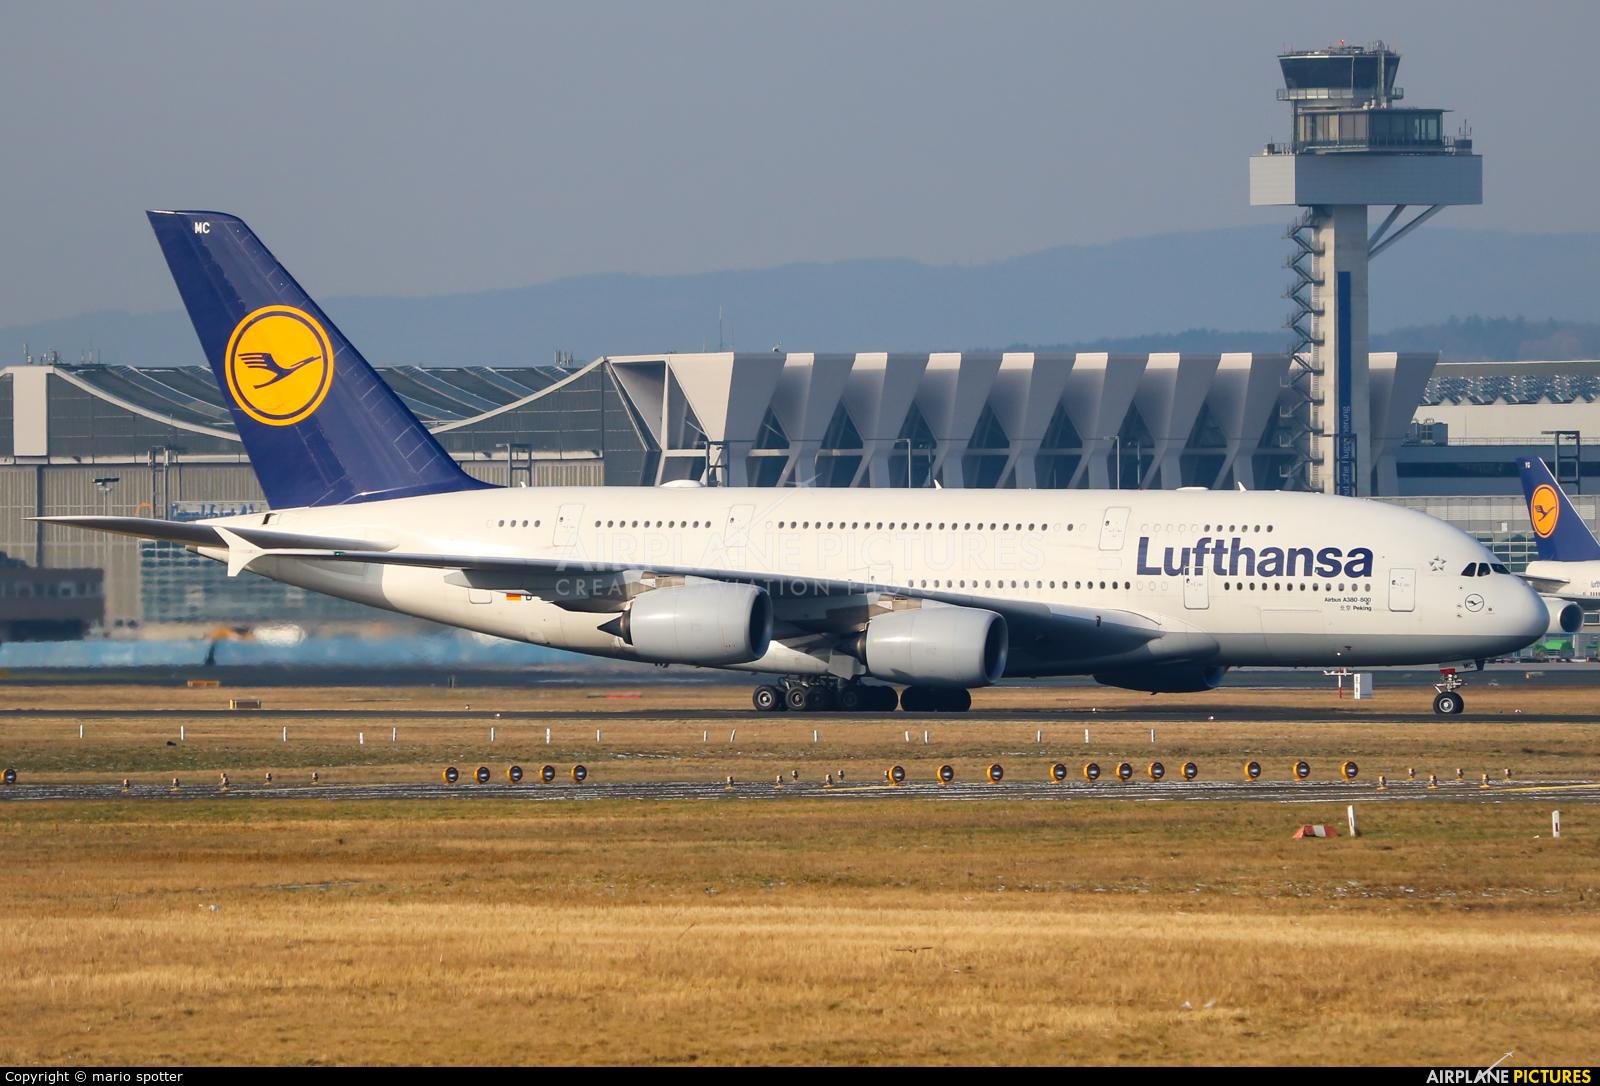 Lufthansa D-AIMC aircraft at Frankfurt